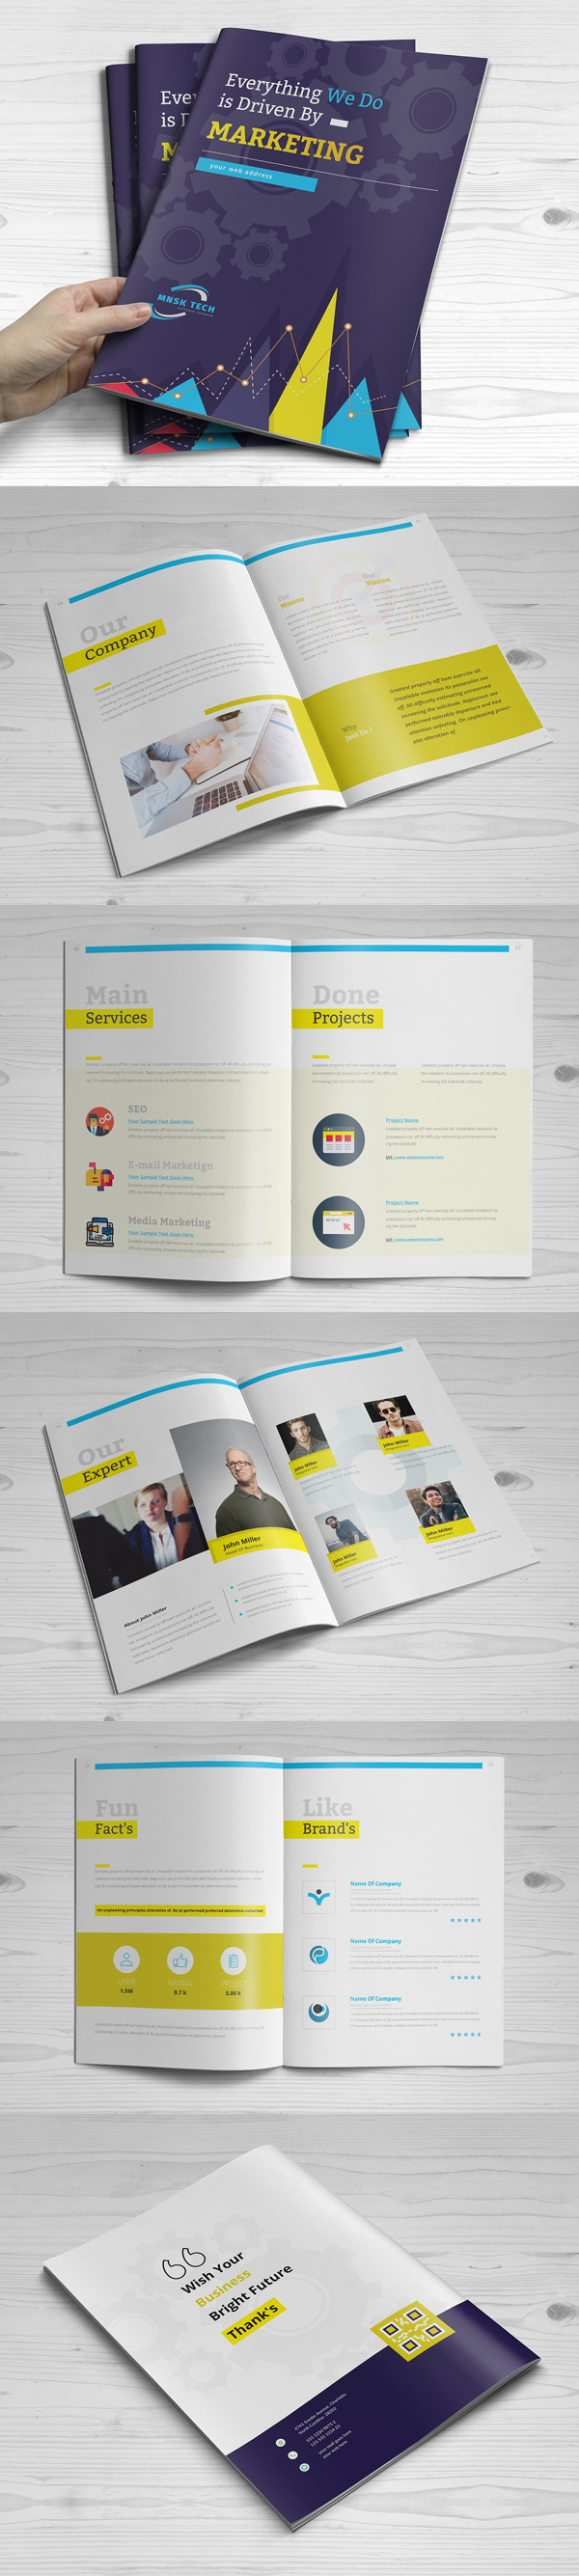 100 Professional Corporate Brochure Templates - 1